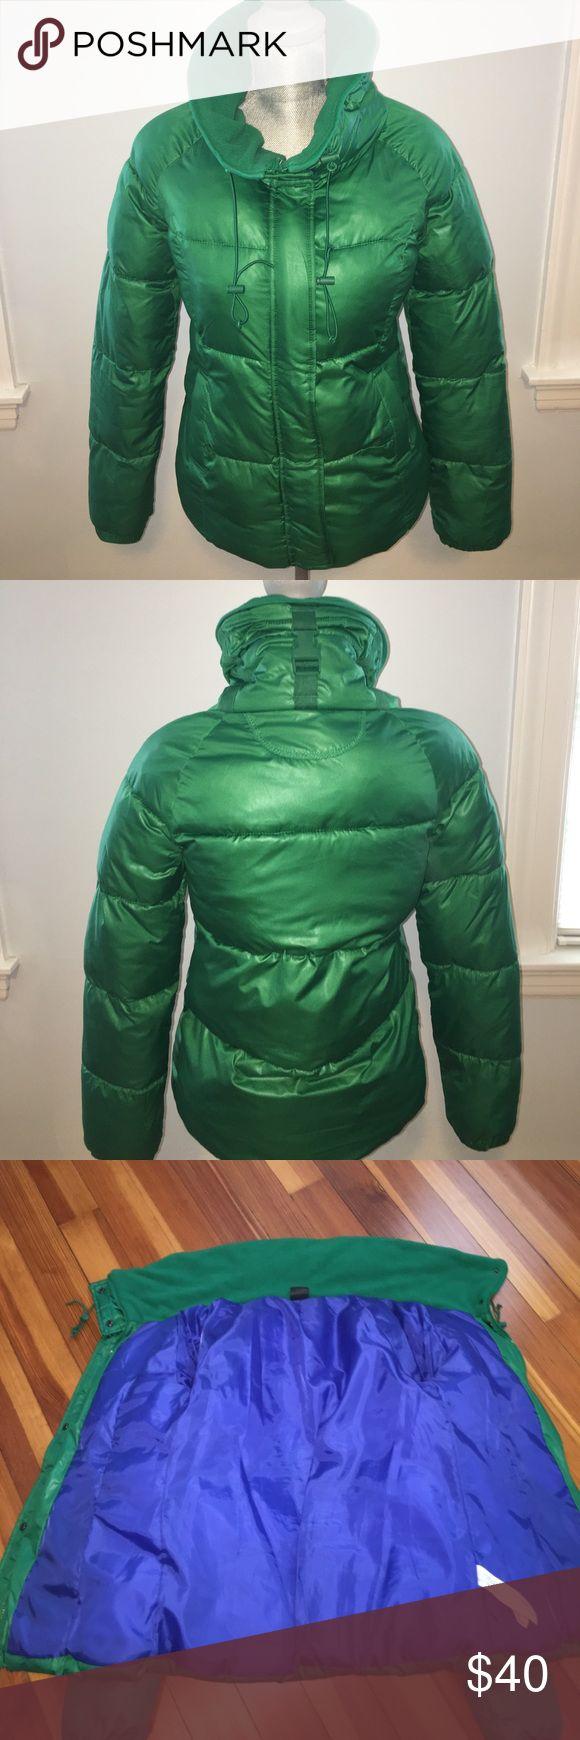 Basic Collection from Zara winter jacket! Size M! Basic collection from Zara winter jacket. Great condition! Size M! Zara Jackets & Coats Puffers